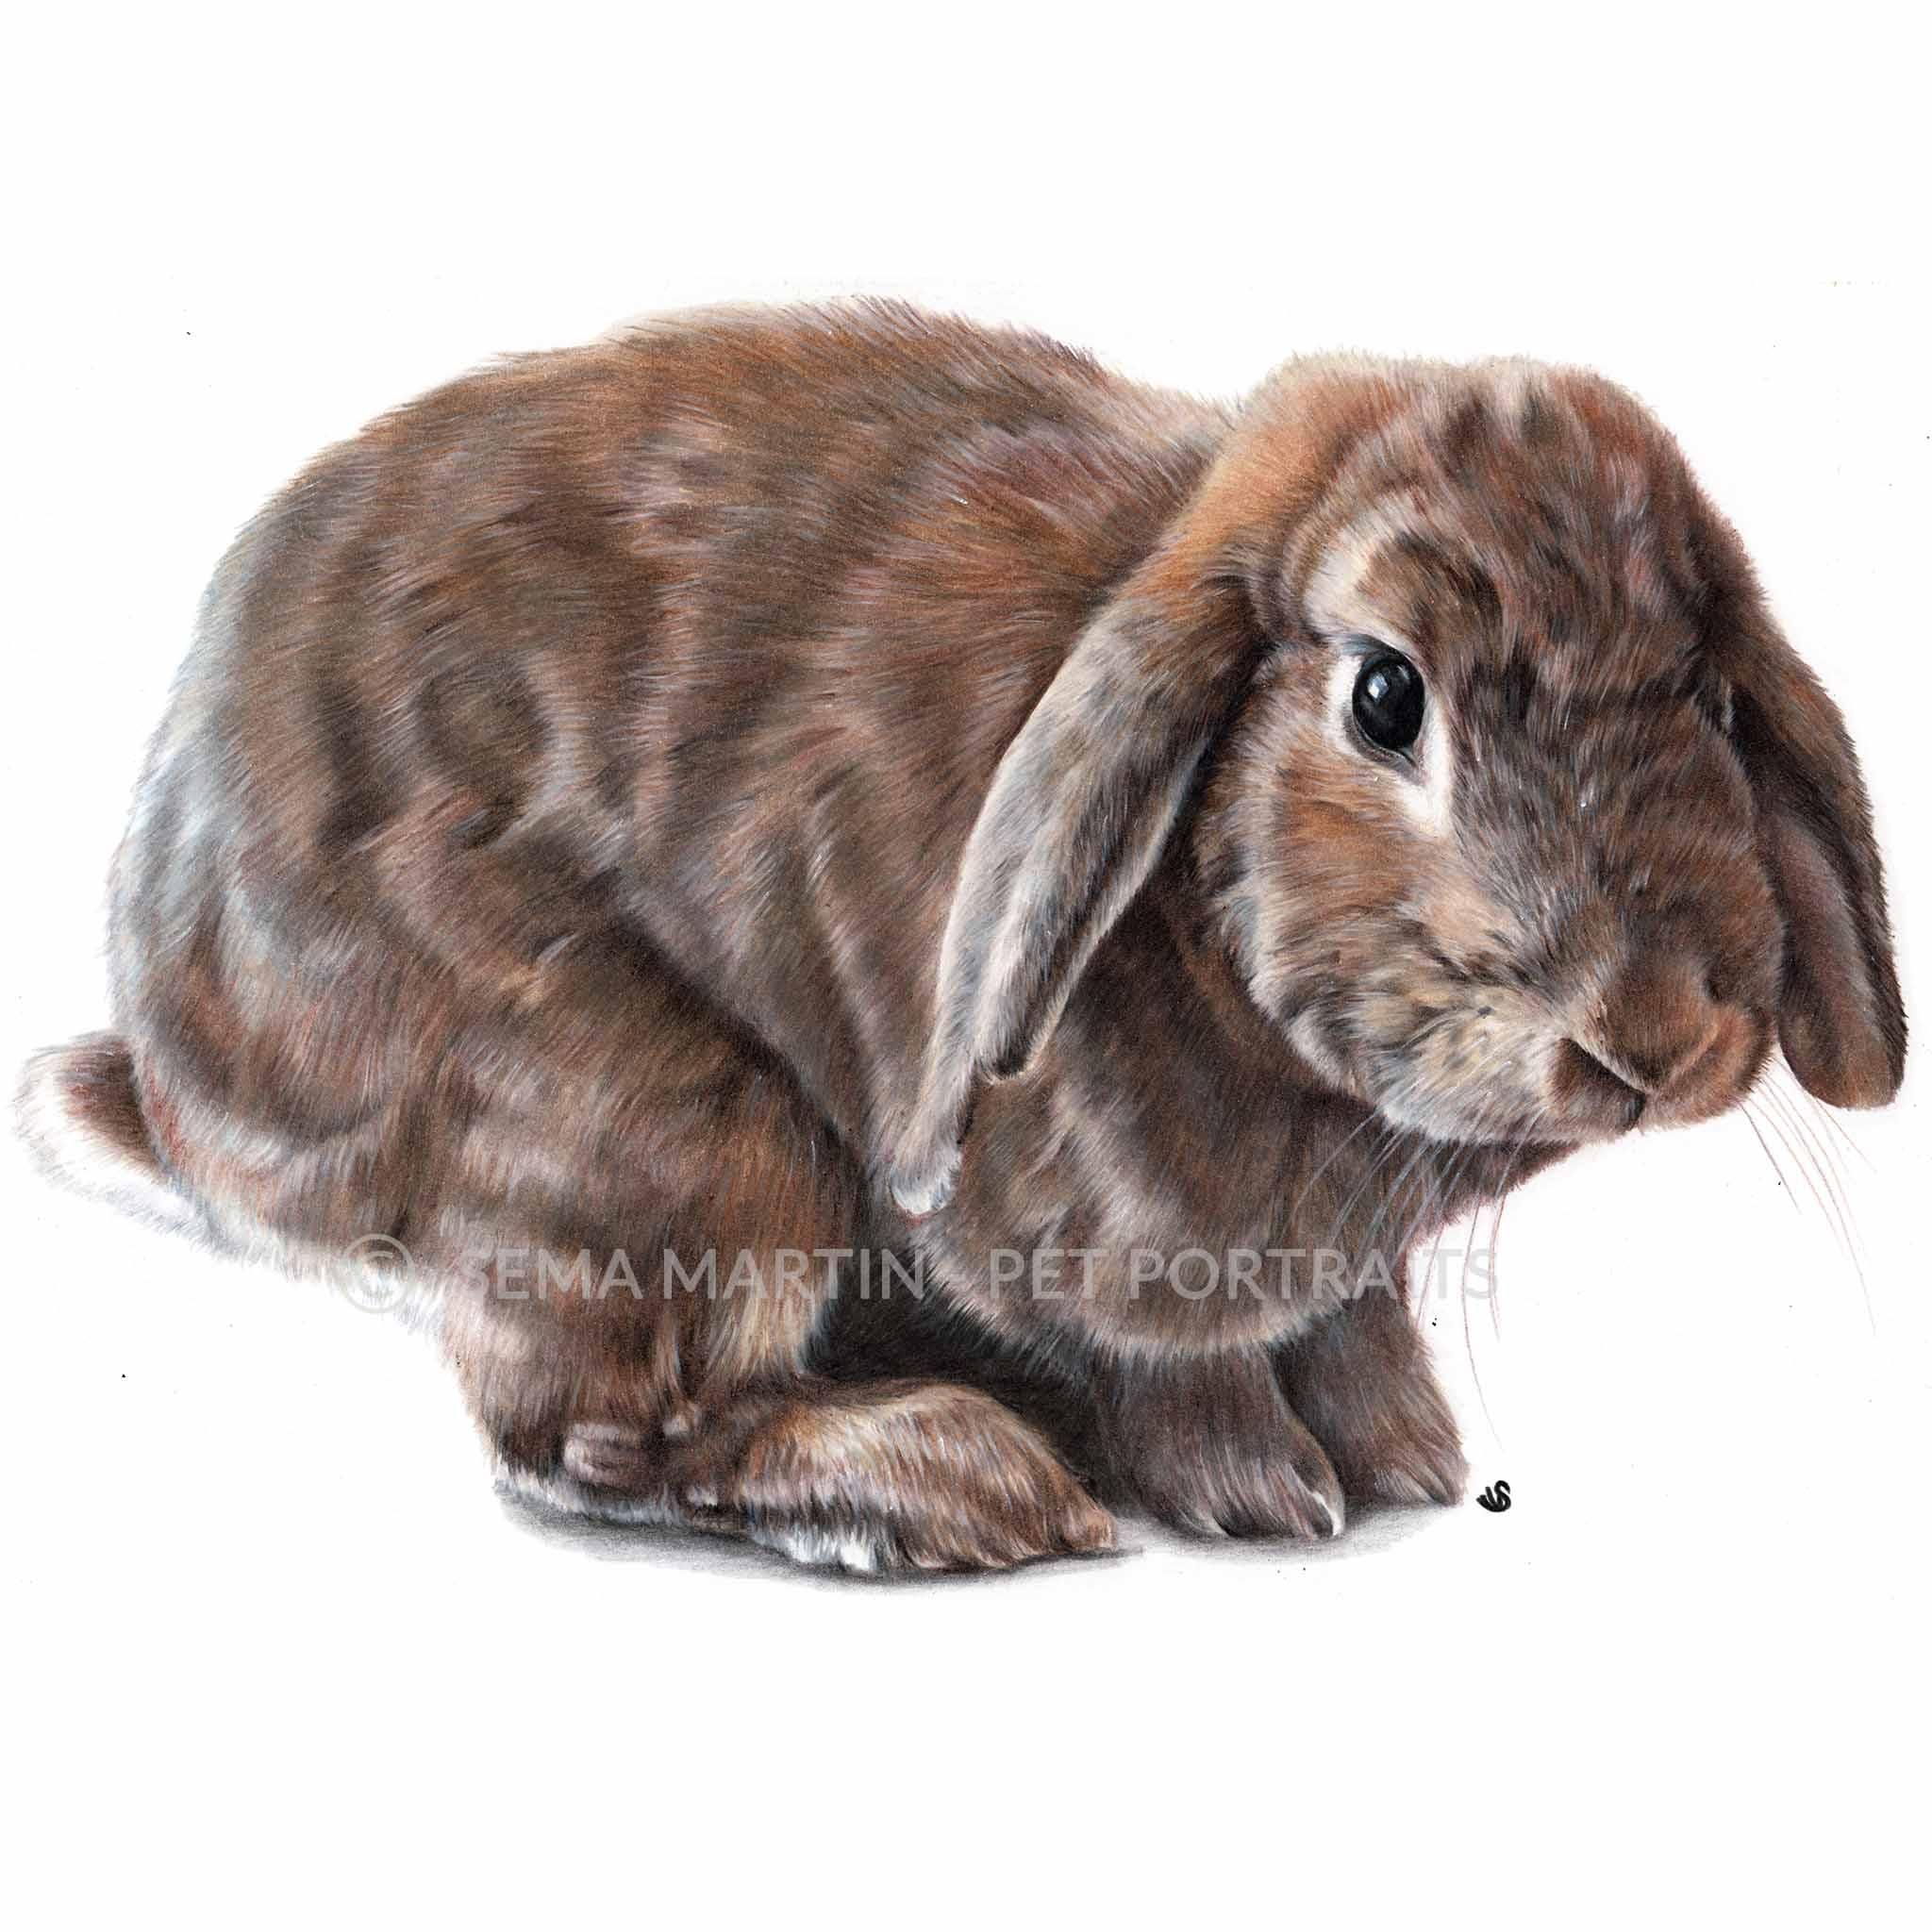 'Tink' - UK, 8.3 x 11.7 inches, 2019, Colour Pencil Portrait of a Rabbit